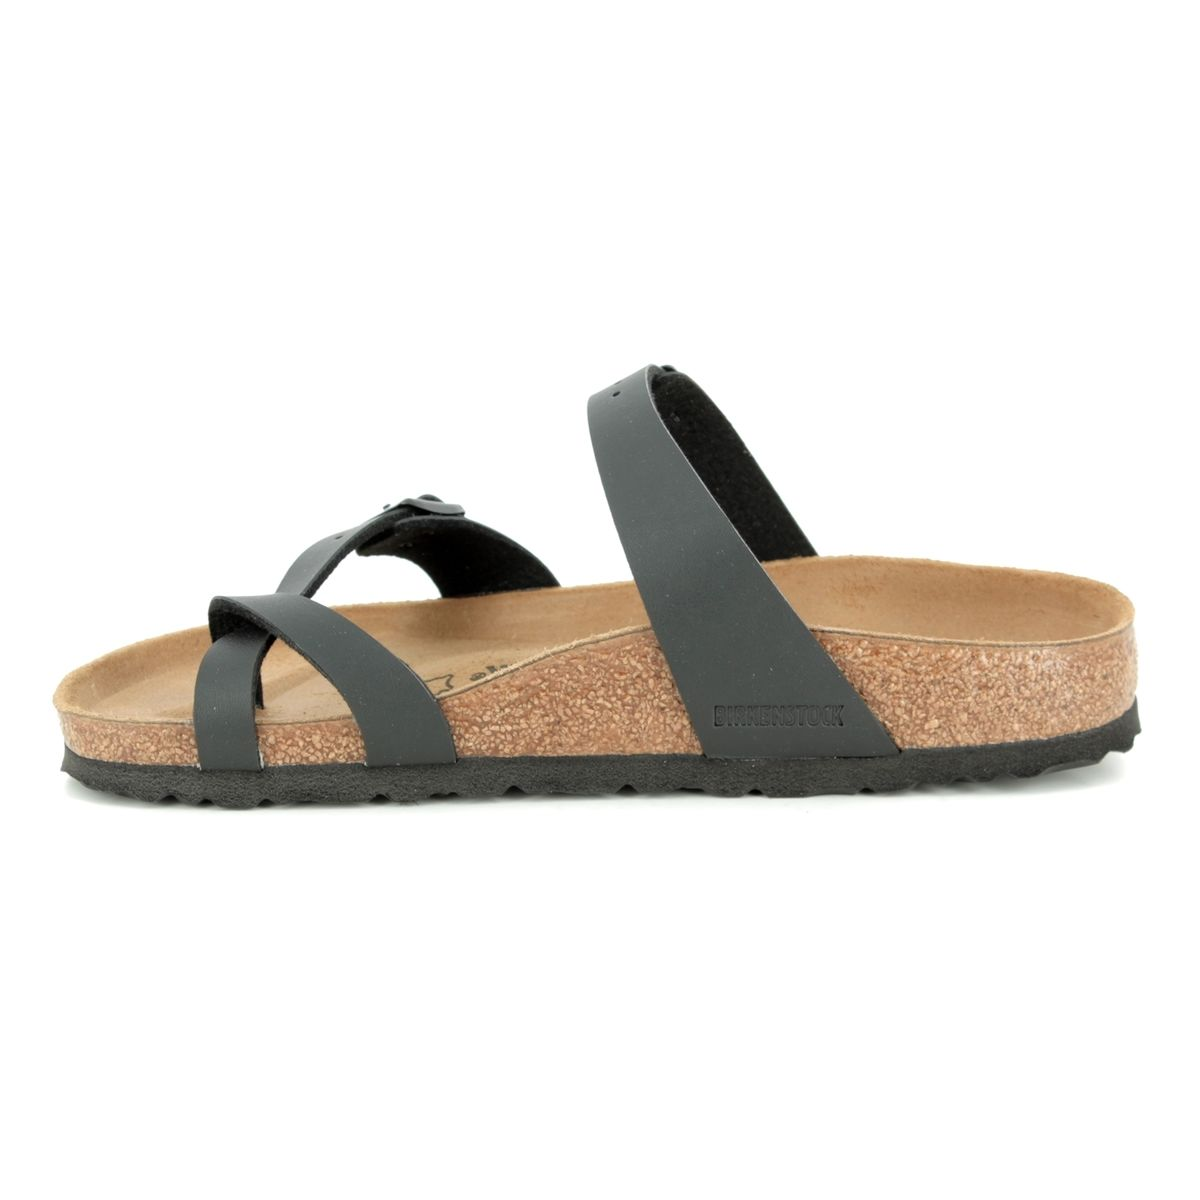 Sandals Nnxok8wp0 Toe Mayari Post Black 0071793 Birkenstock FuJ3cTK1l